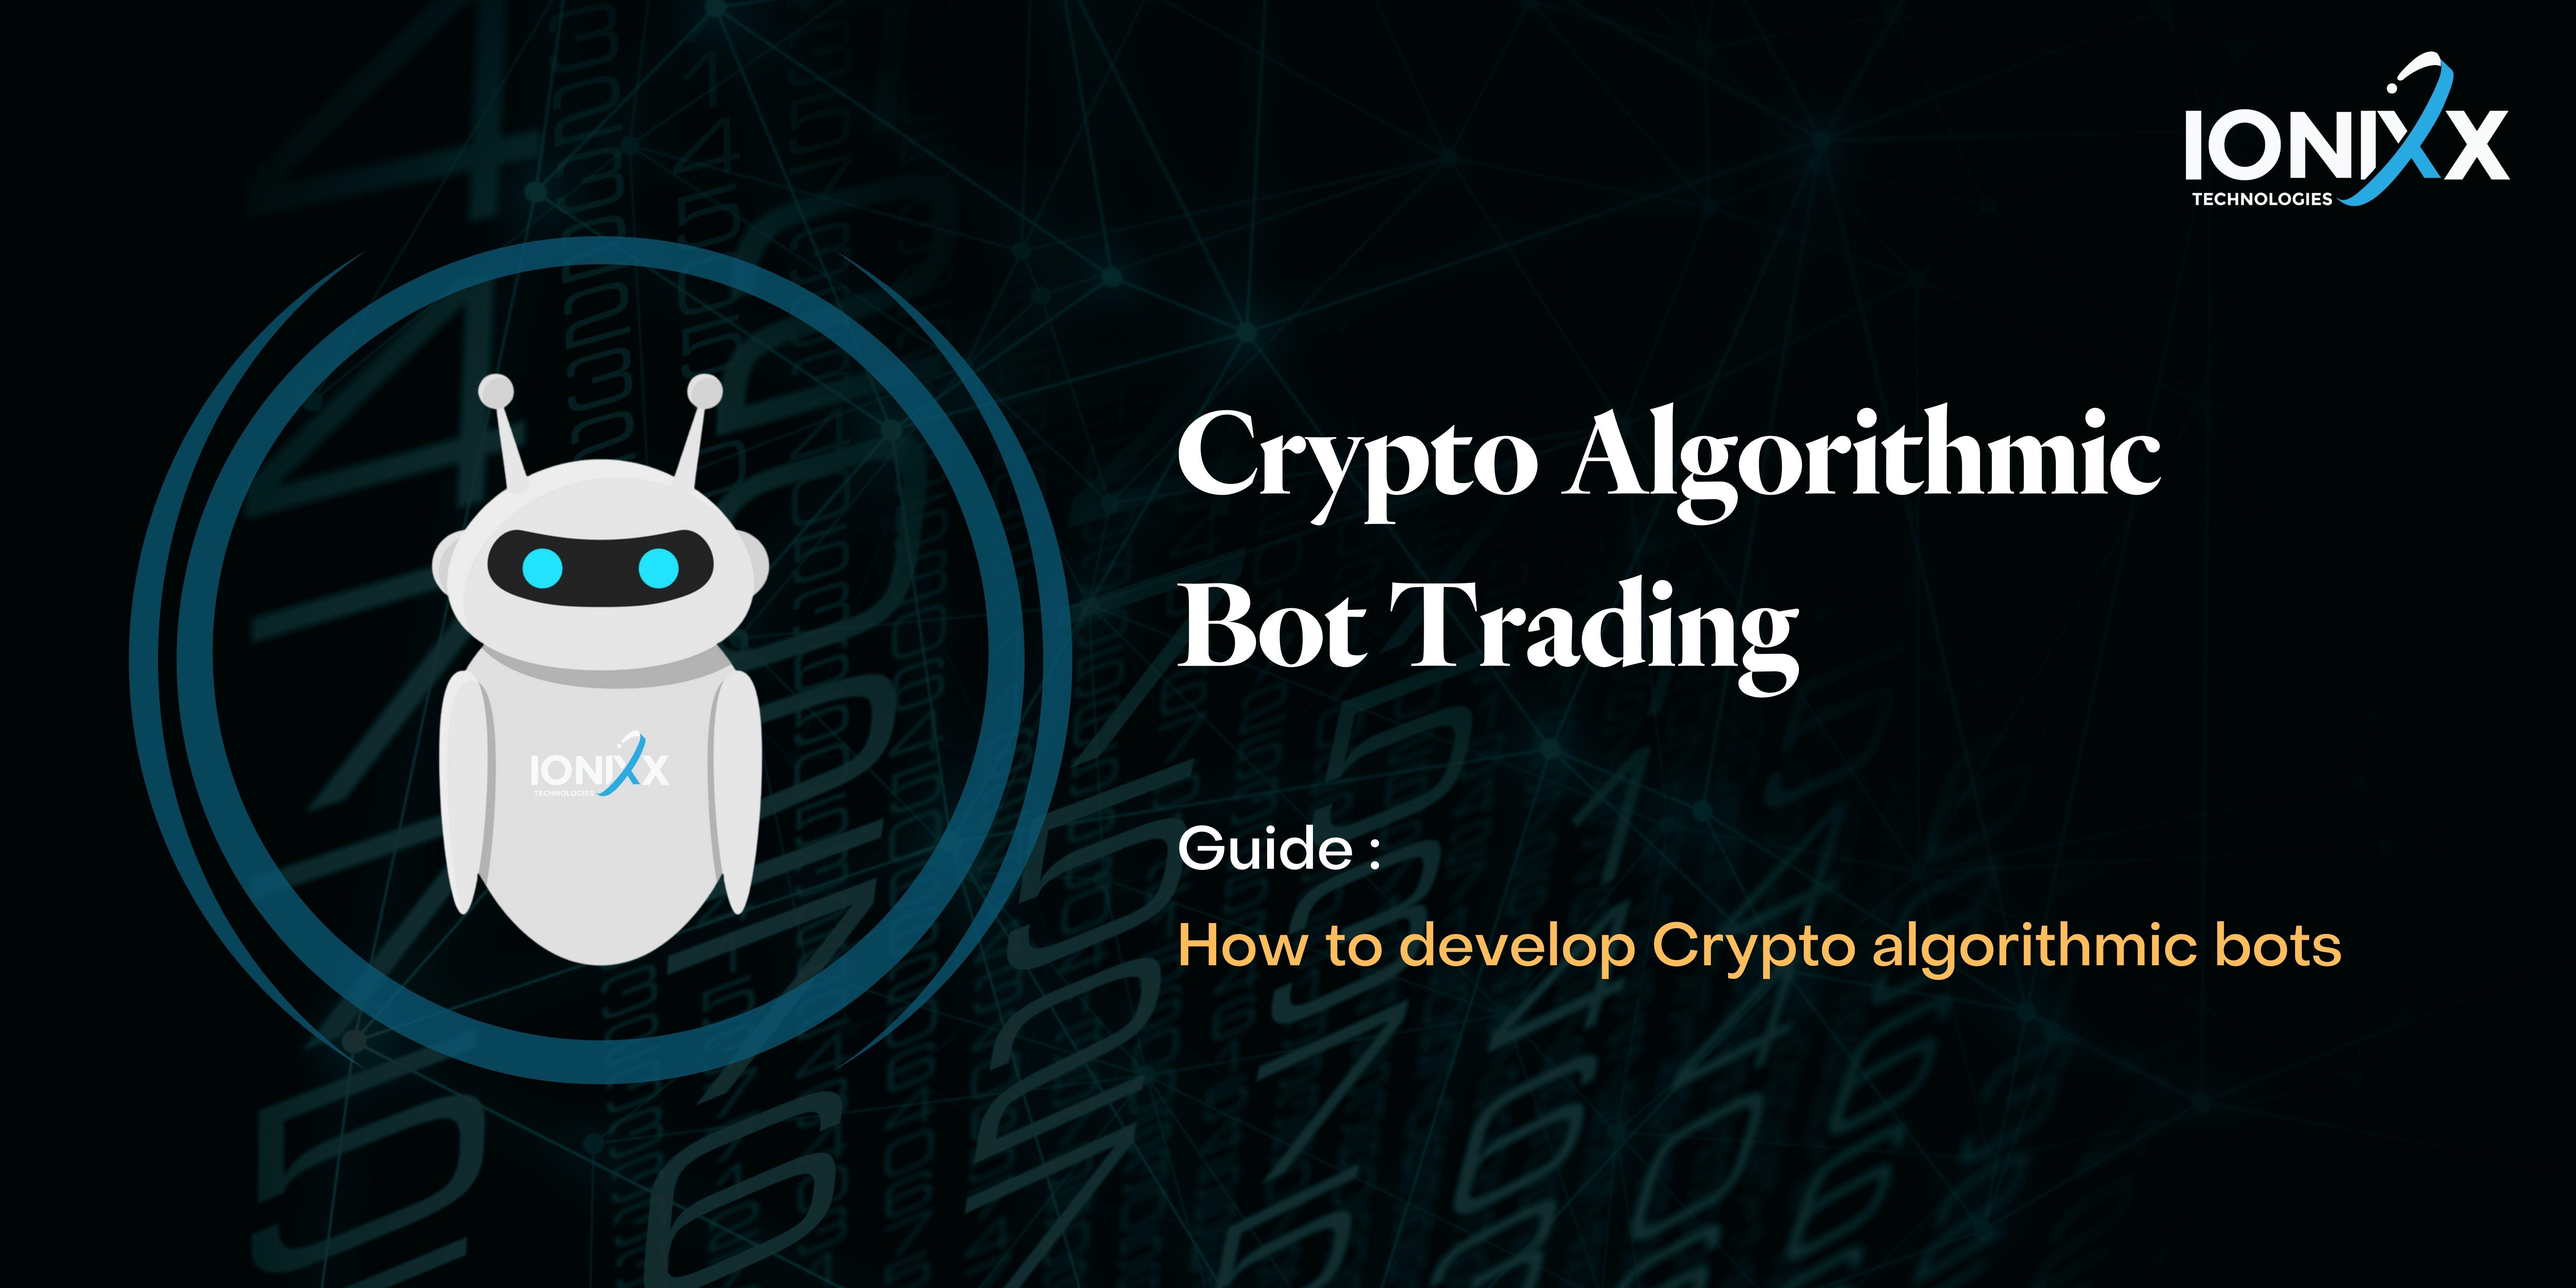 Crypto Algorithmic Bot development